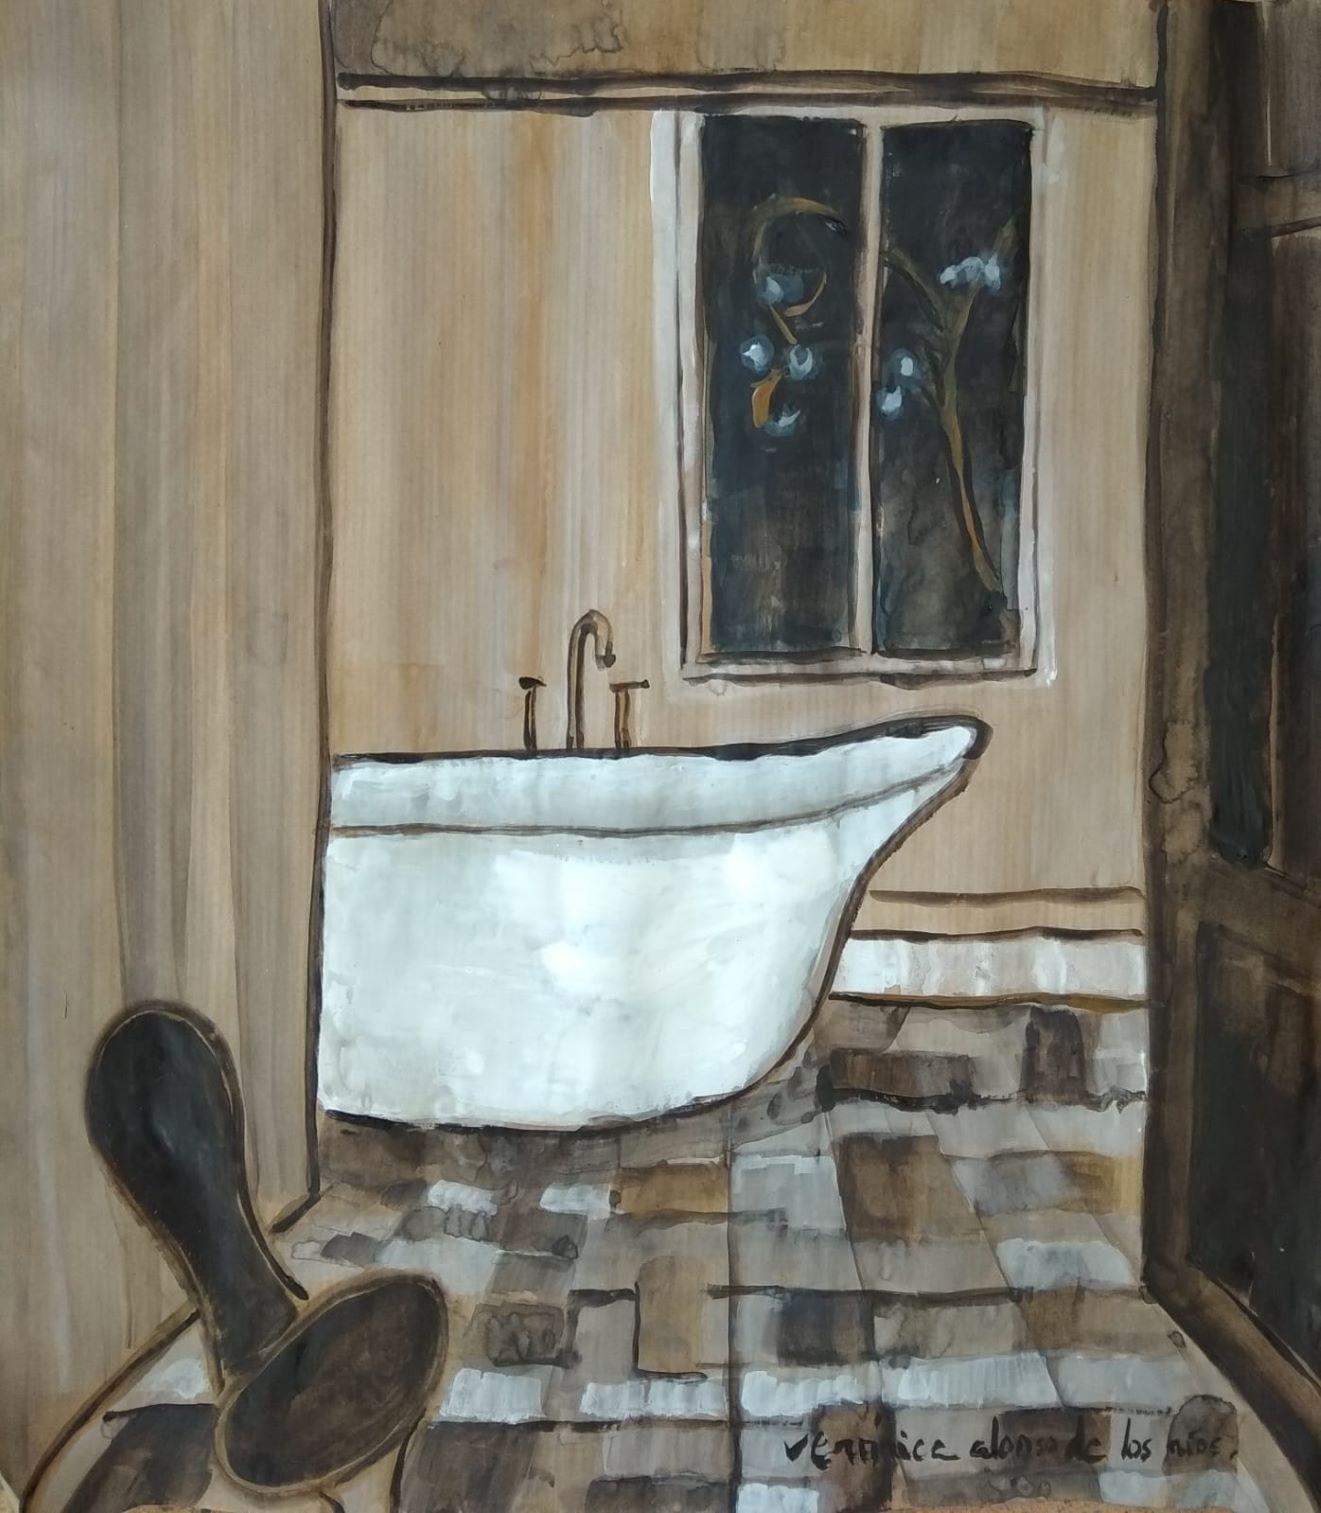 Bath time_VeronicaAlonsodelosRios